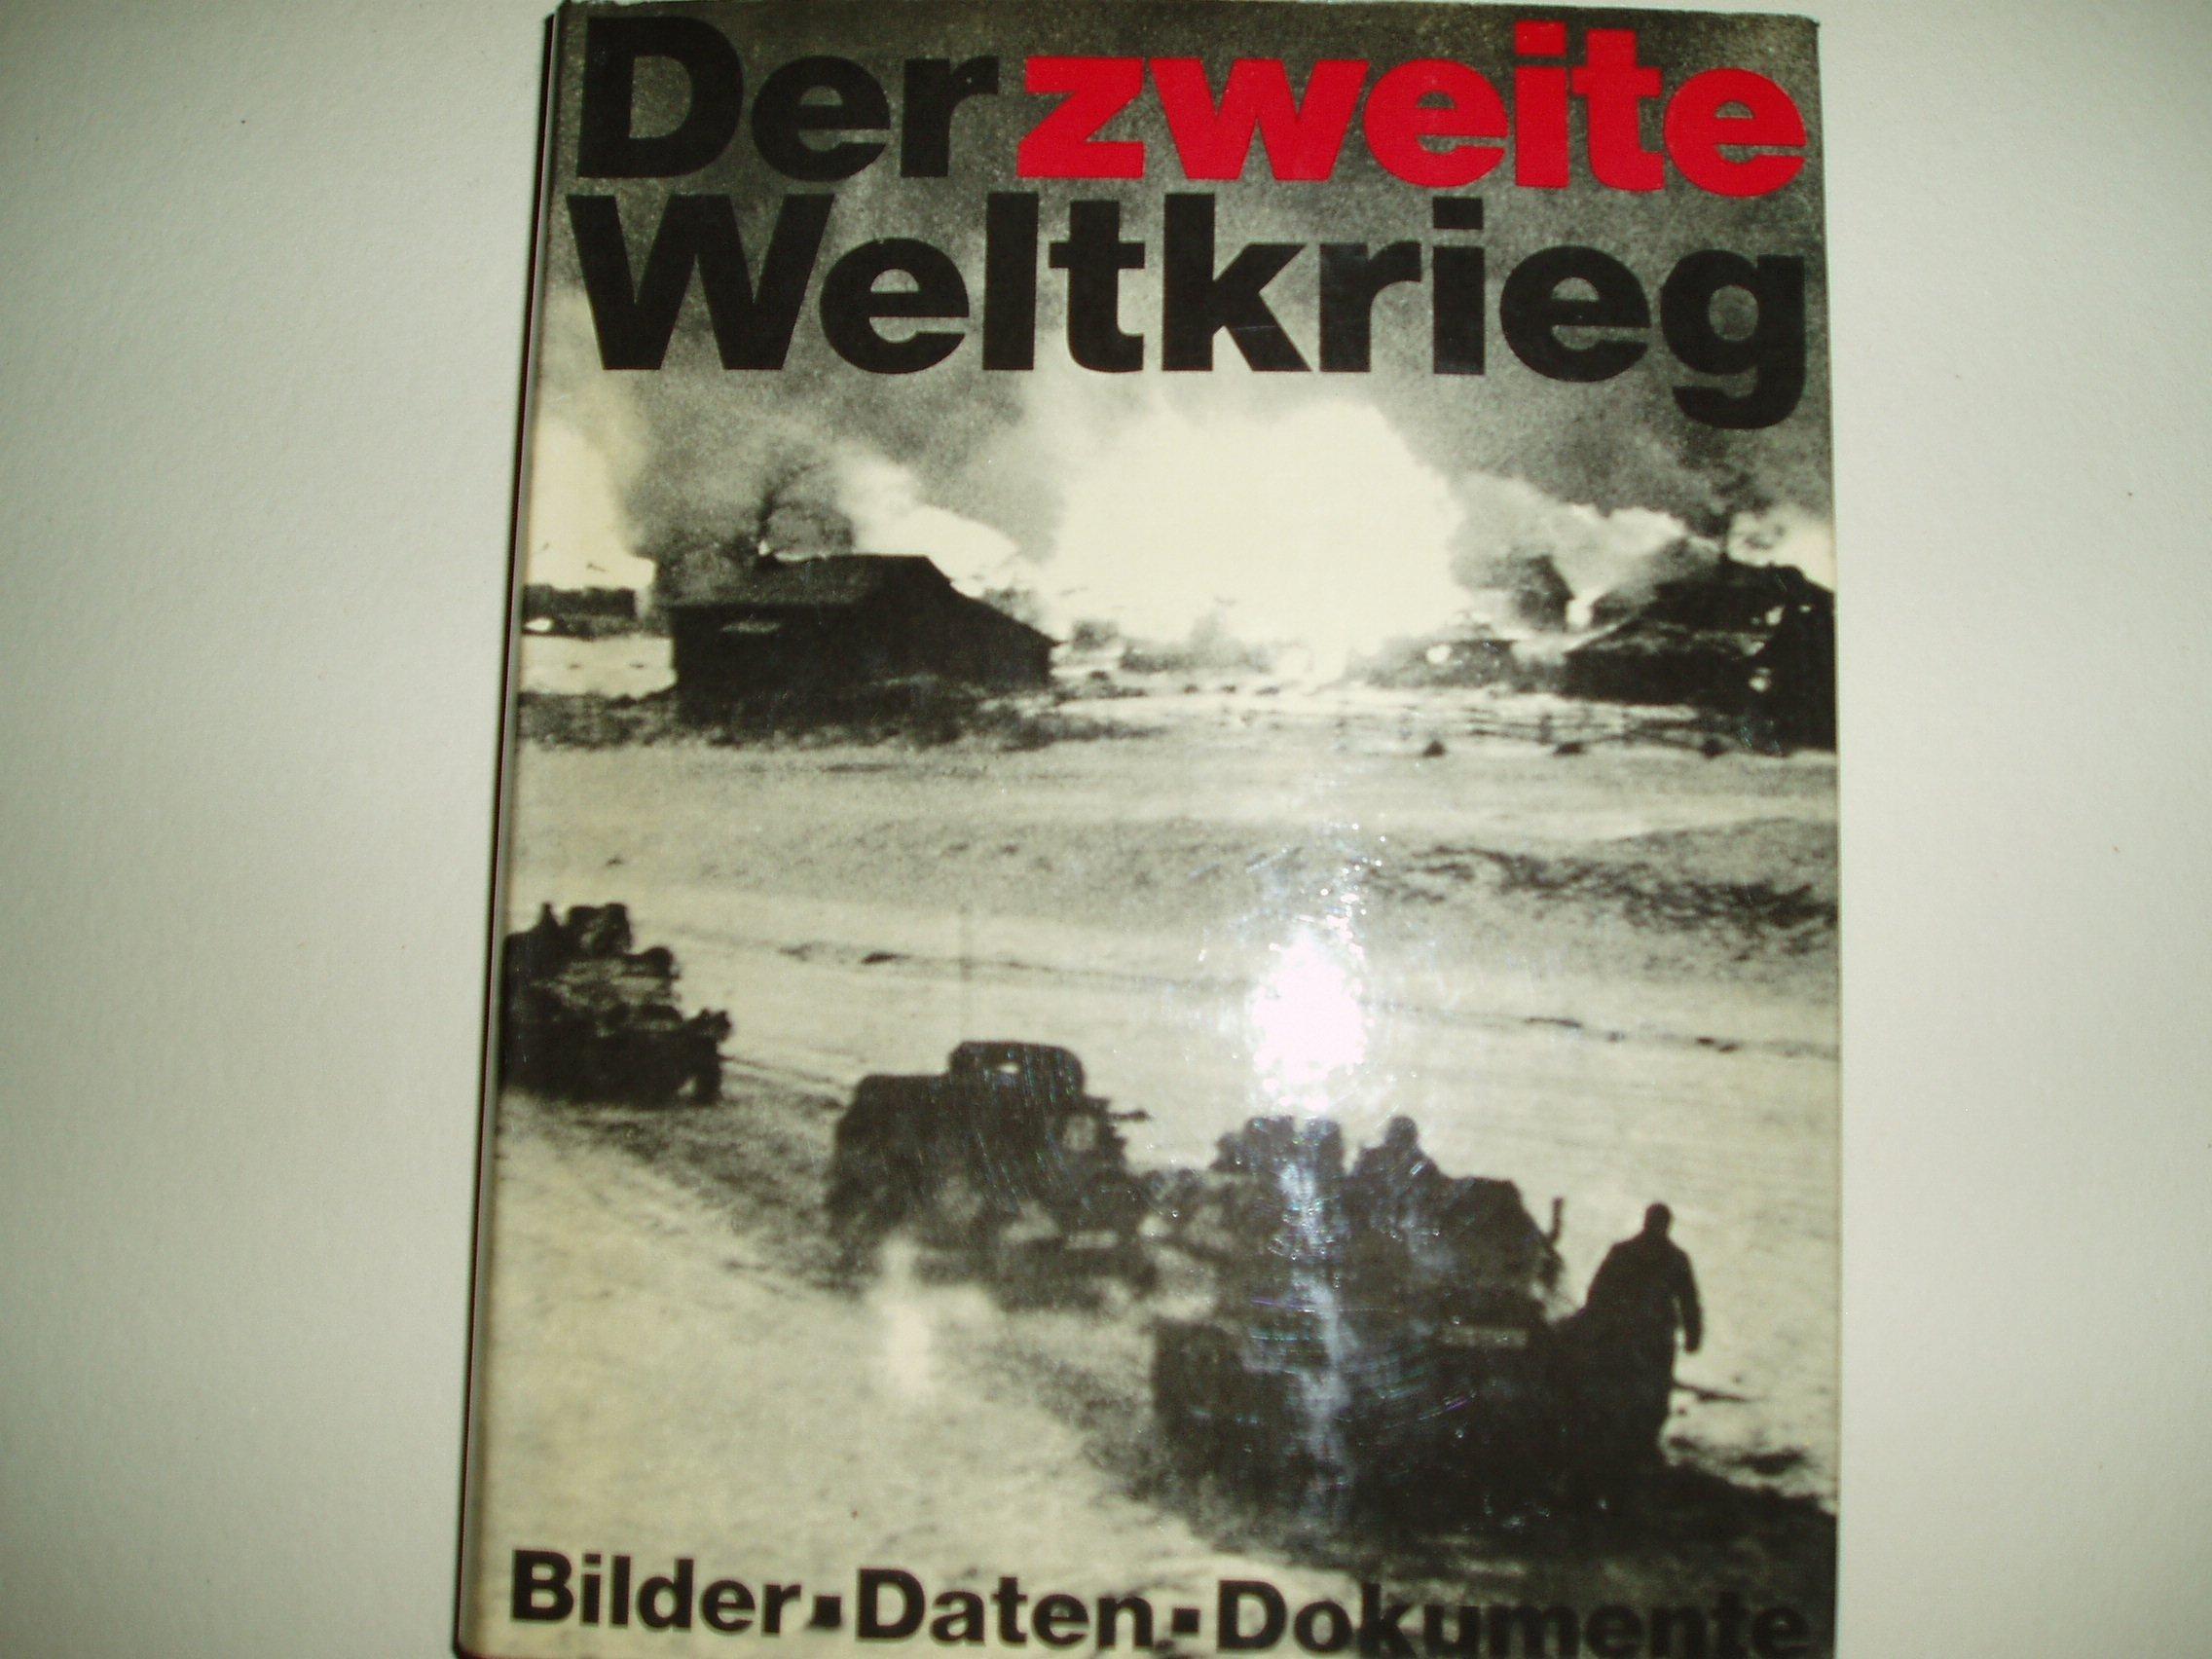 Bertelsmann Lexikon Verlag